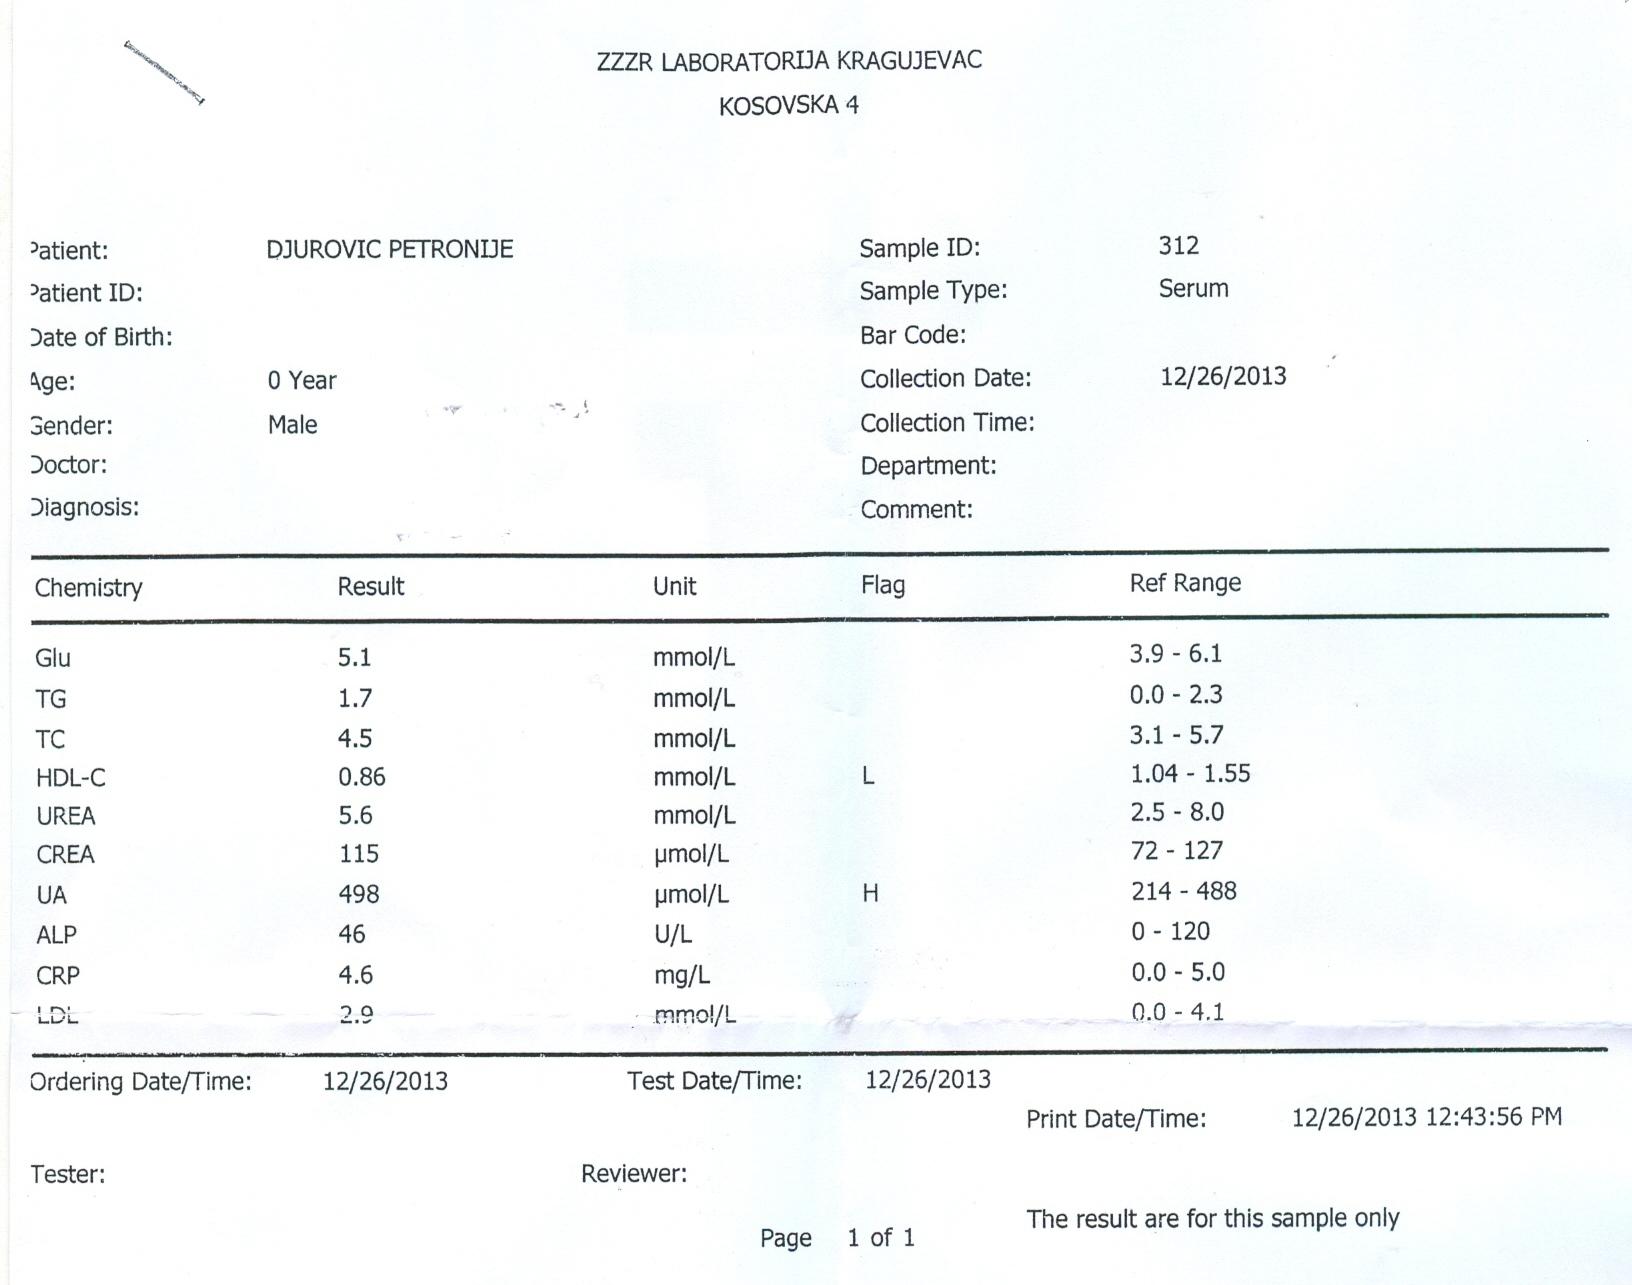 Petronije Djurovic, rezultati posle